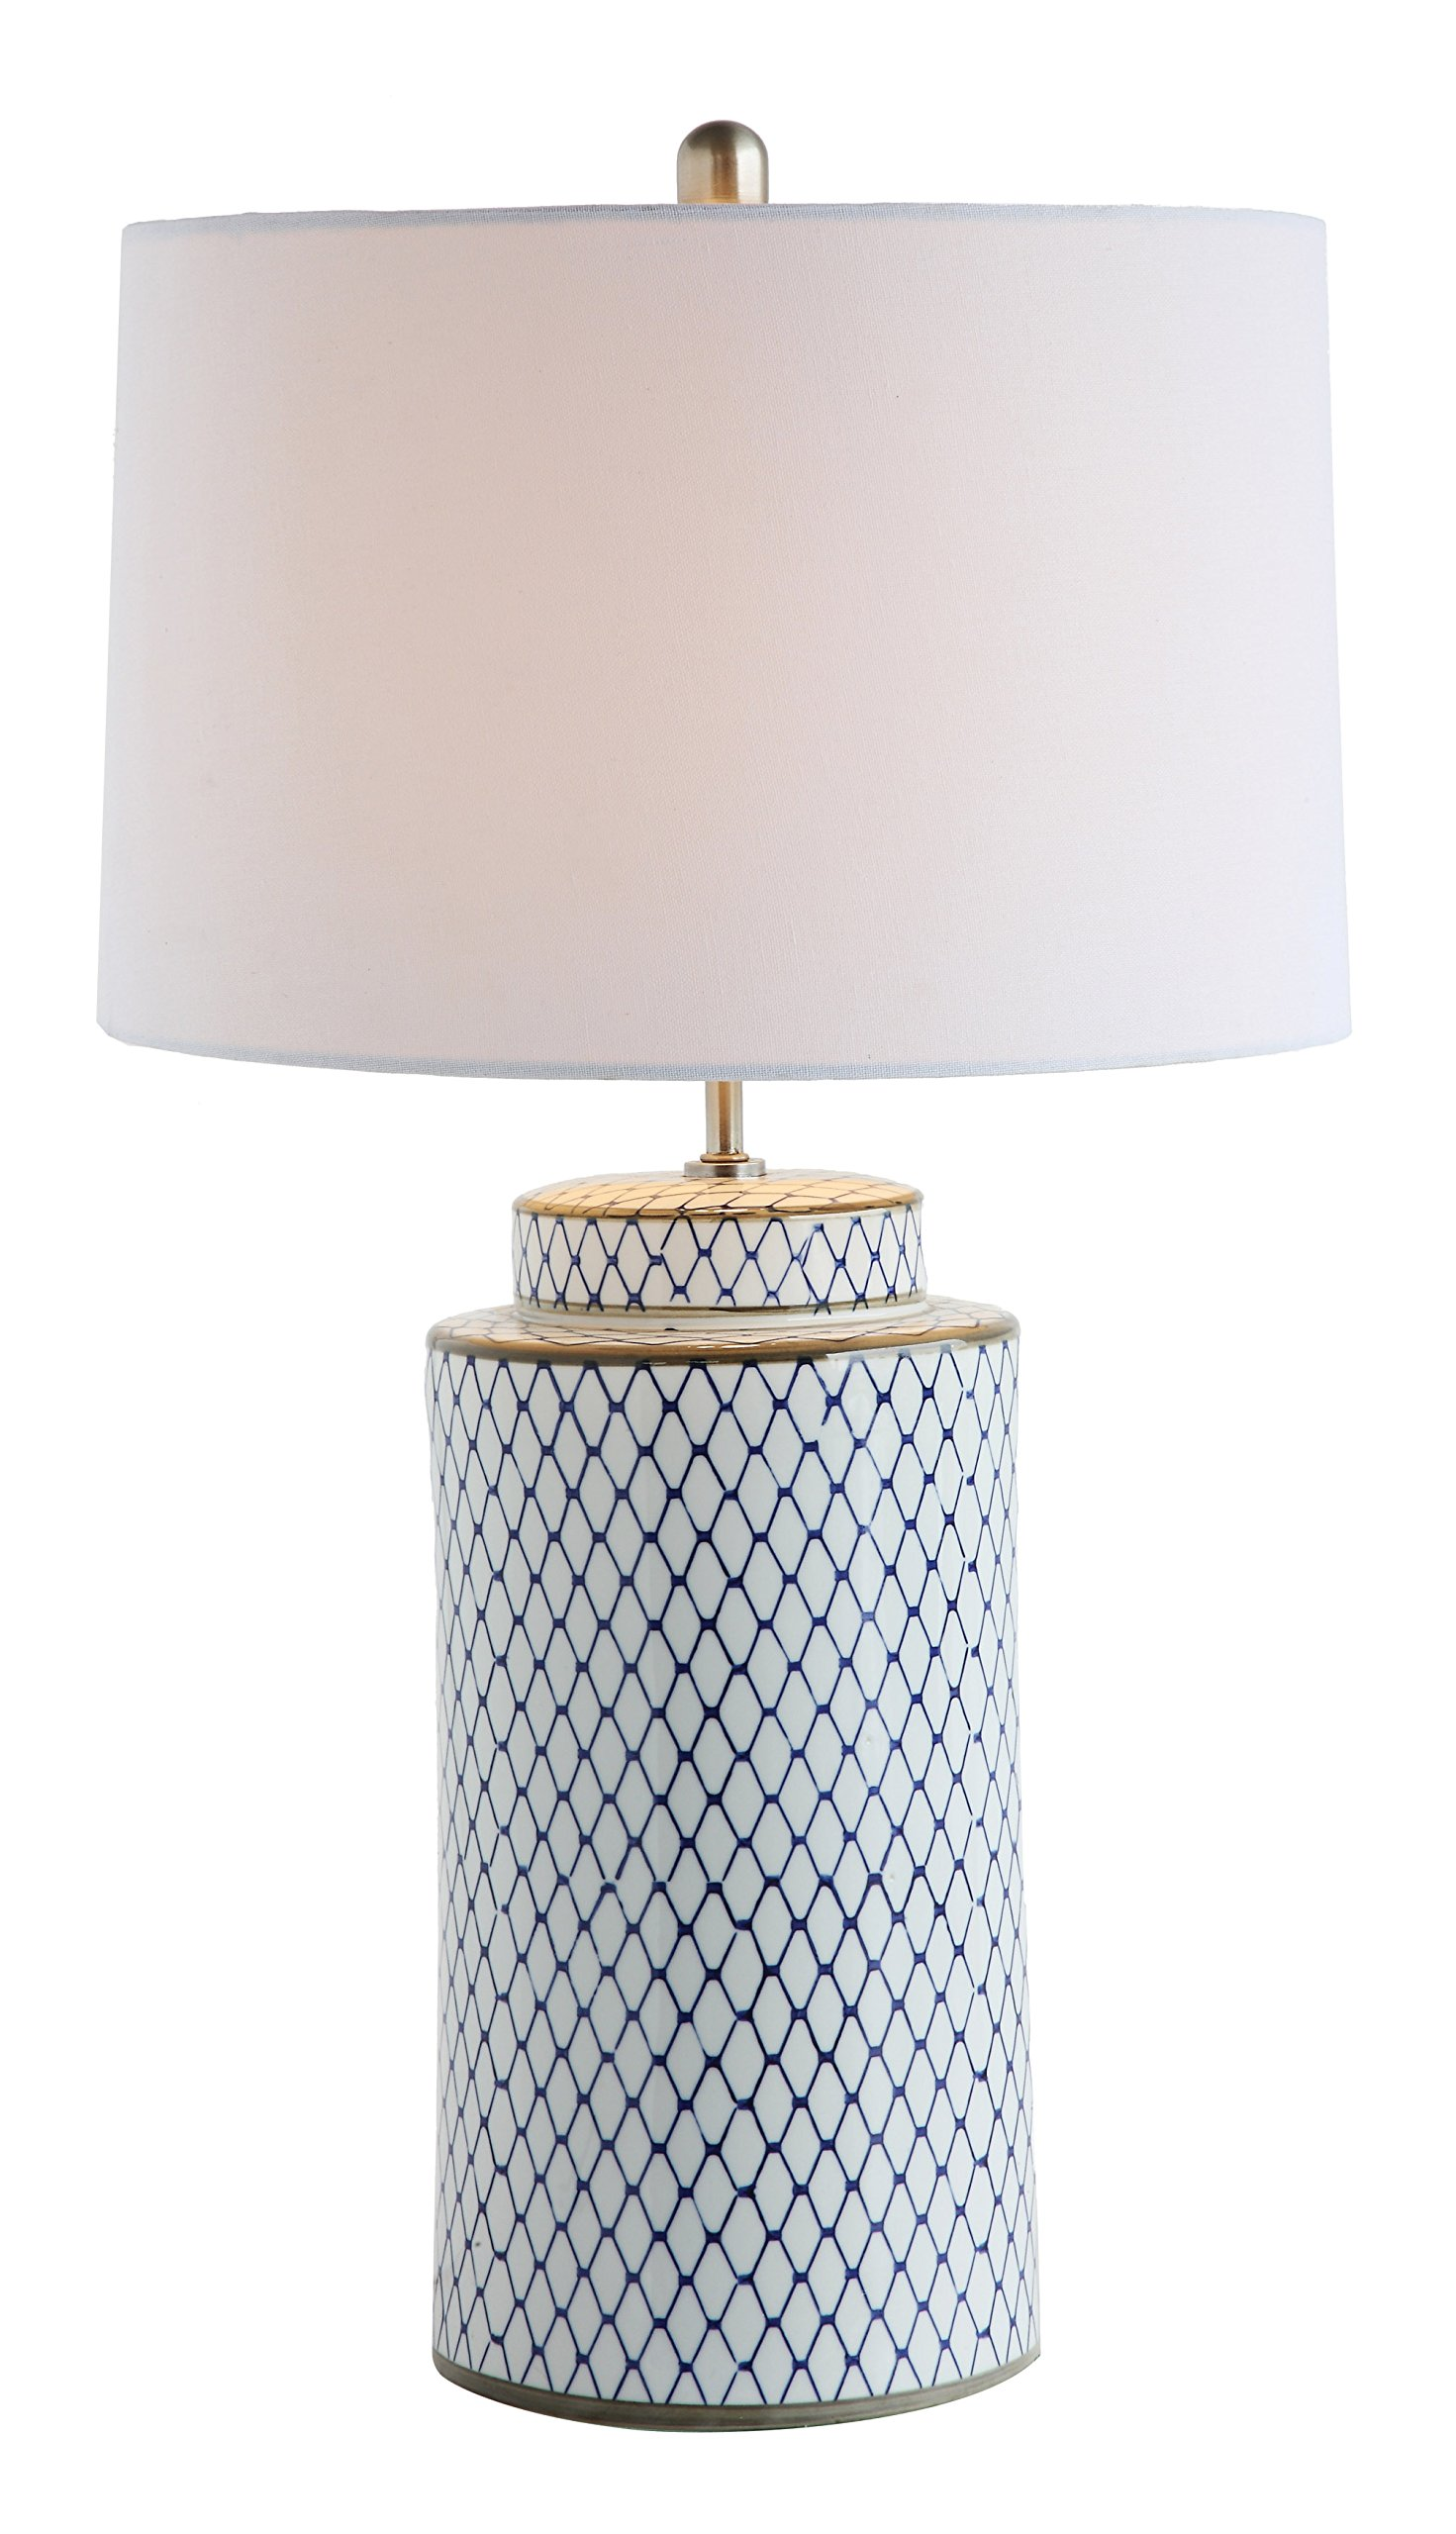 Creative Co-Op DA6750 Waterside Indigo & White Ceramic Table lamp with Linen Shade